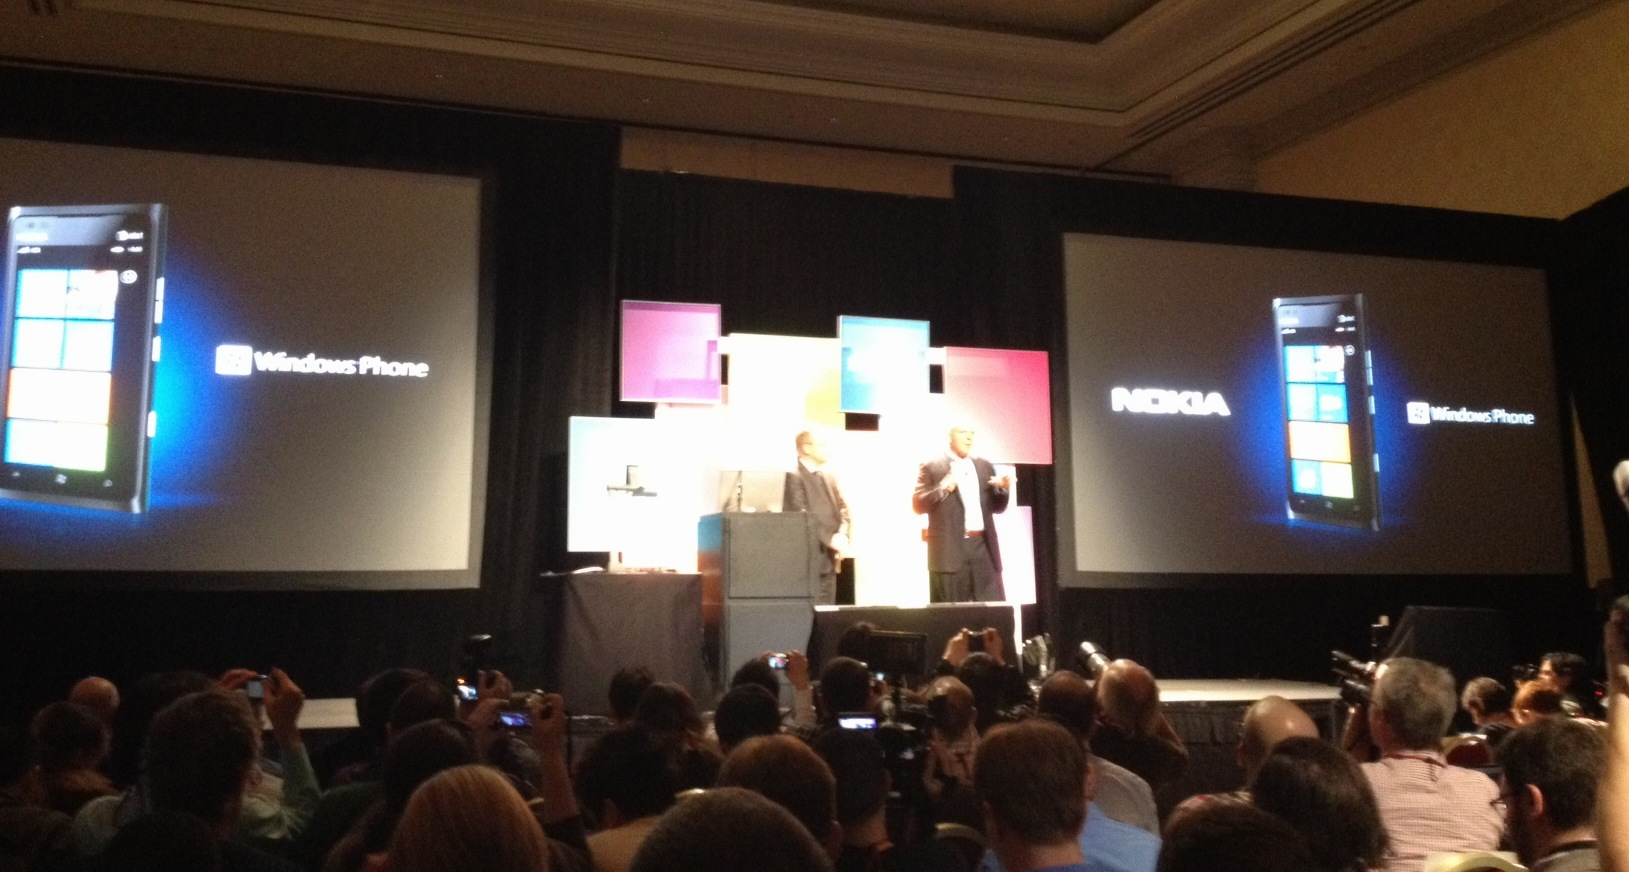 Steve Ballmer na conferência da Nokia (Foto: Nick Ellis/TechTudo)